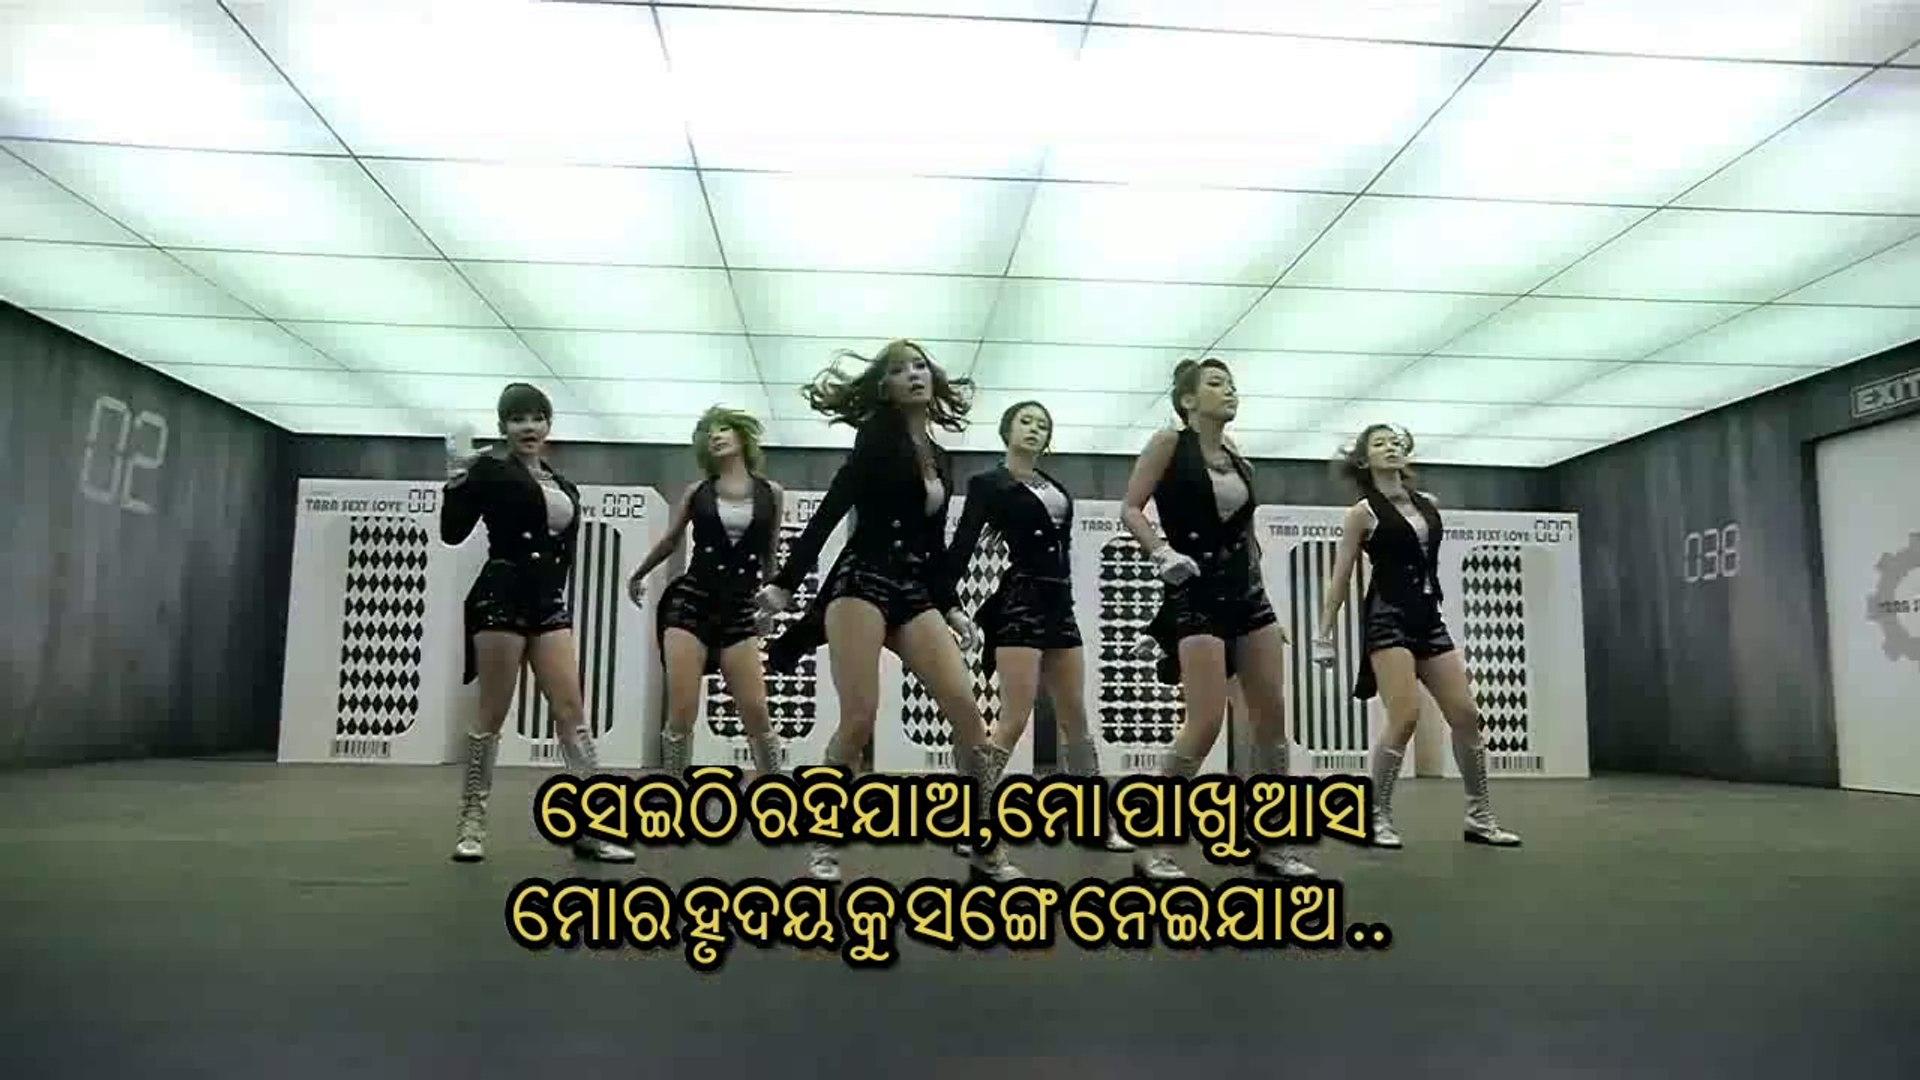 New Odia Song - Sexy Love HD | T-ARA Sexy Love Oriya Subtitled HD | ଓଡ଼ିଆ ଗୀତ - ସେକ୍ସୀ ଲଭ୍ (ସବ୍-ଟାଇଟ